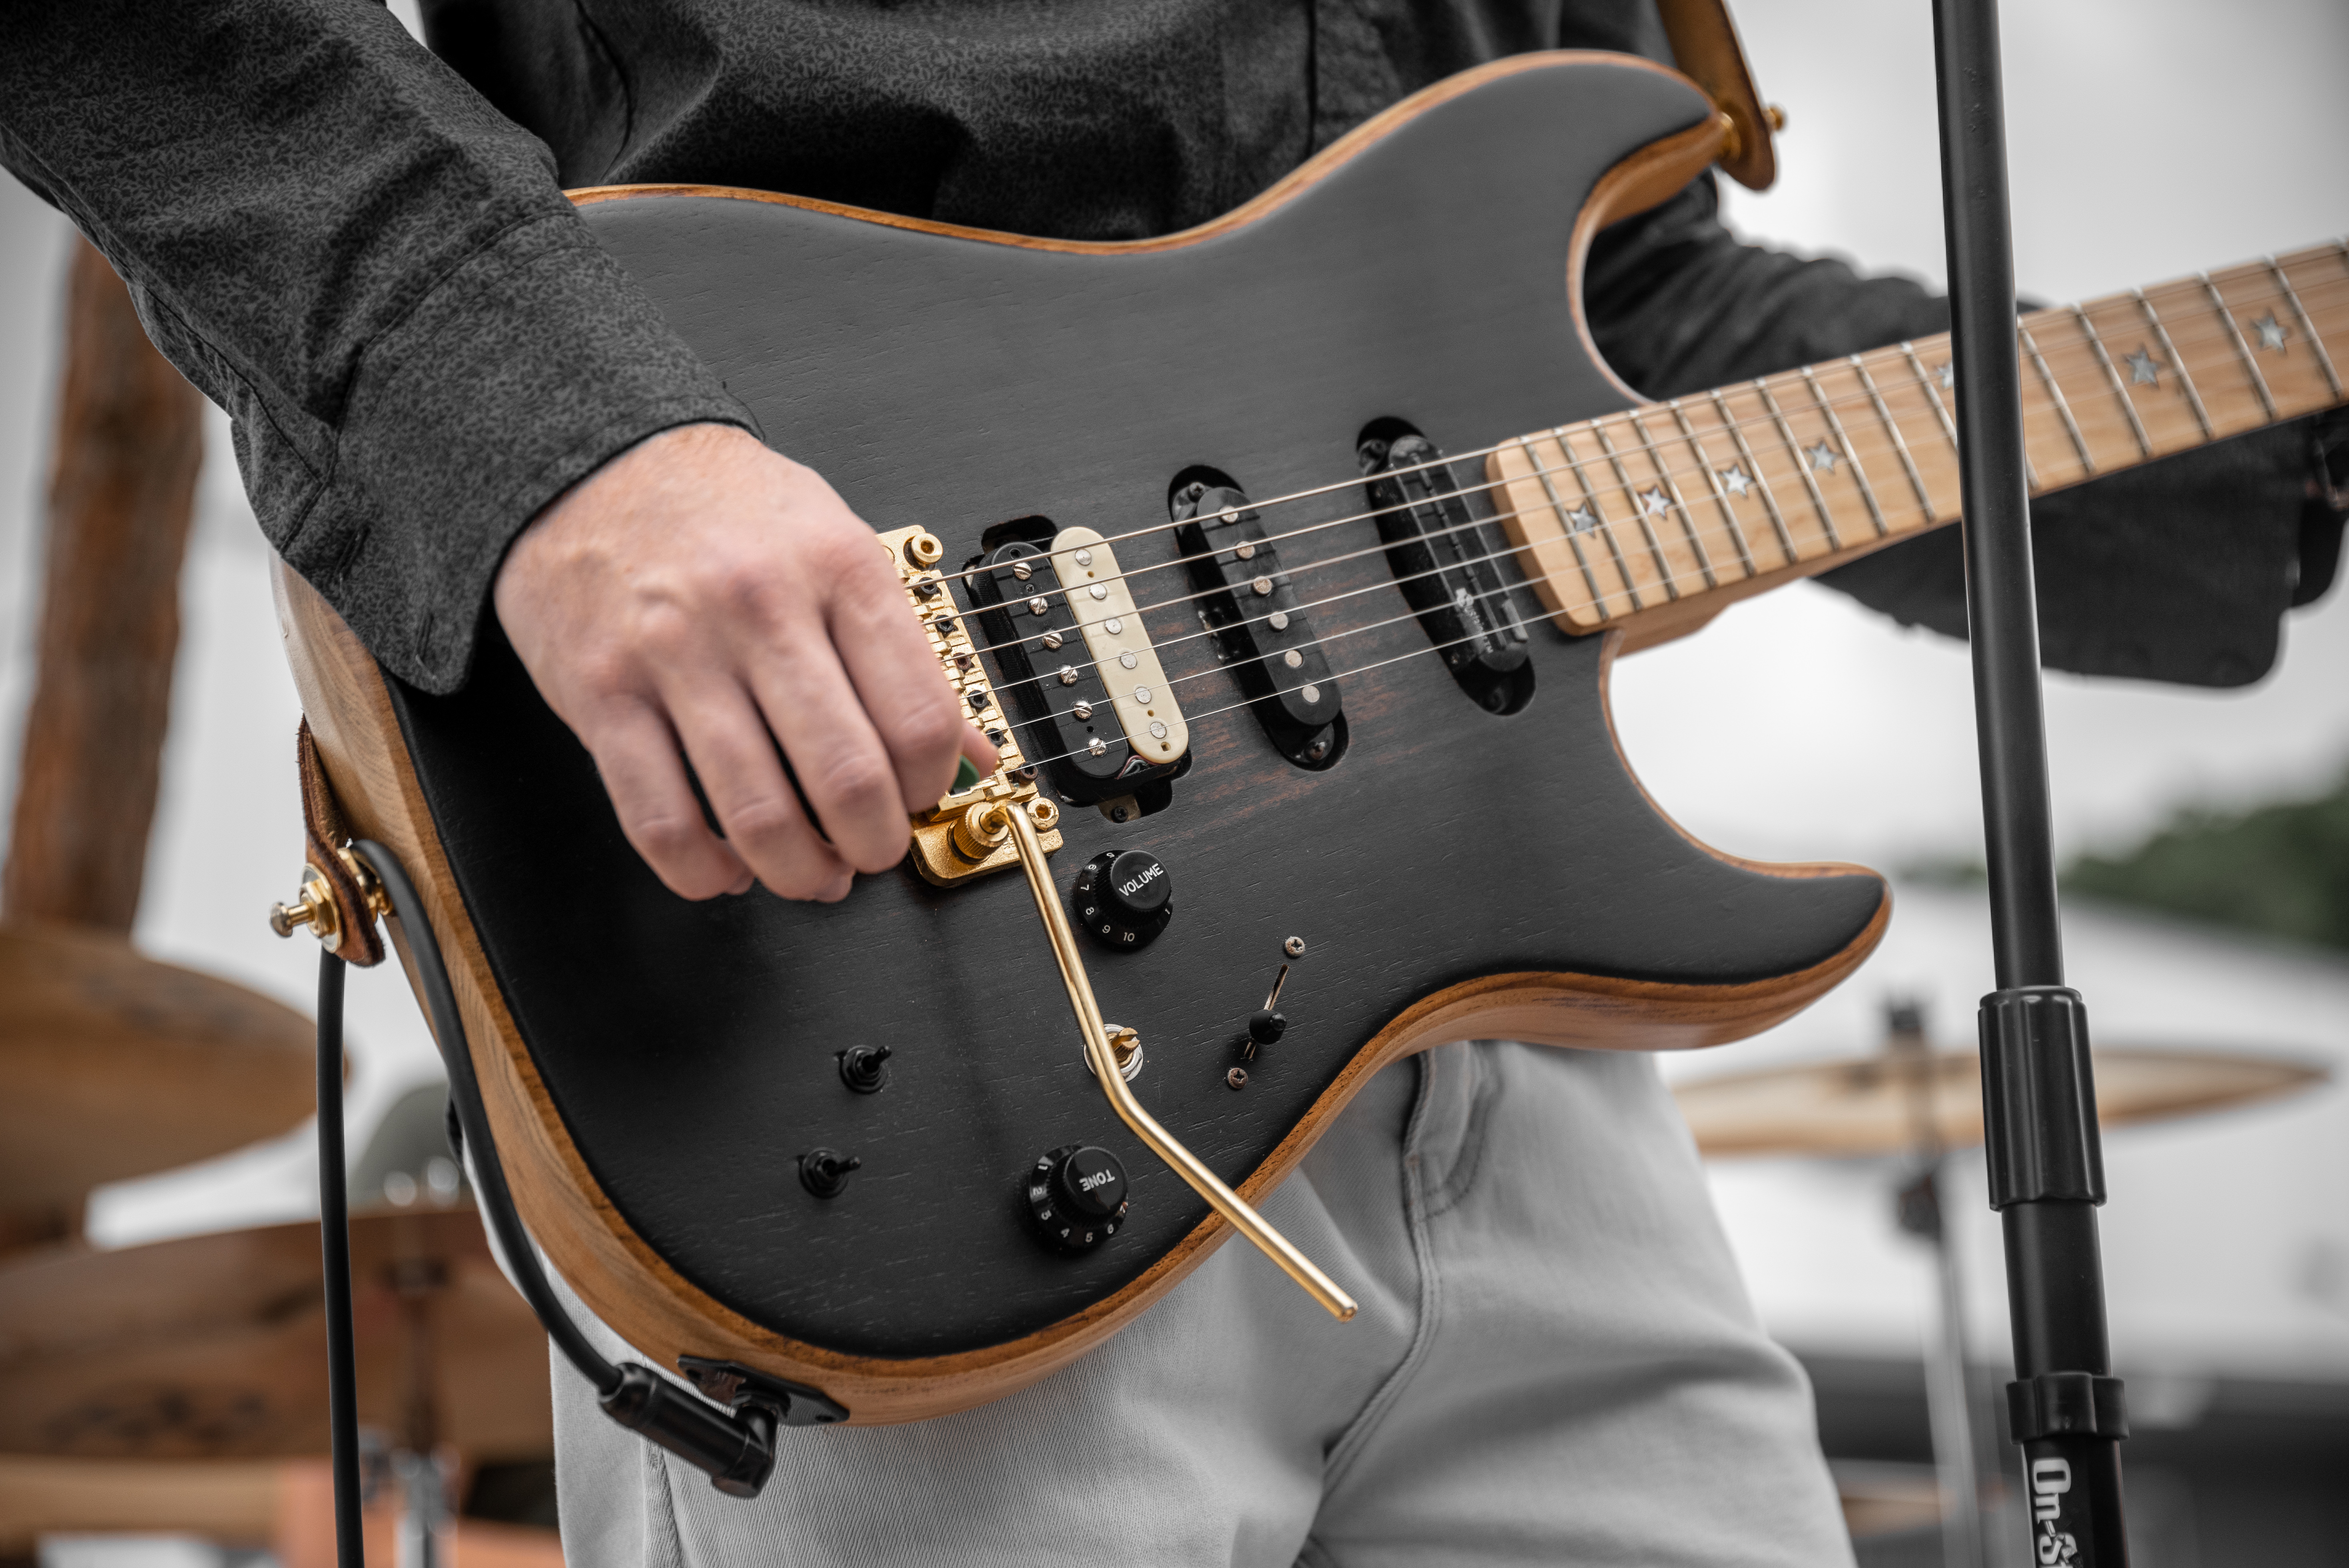 Isaac's custom aPurla guitar